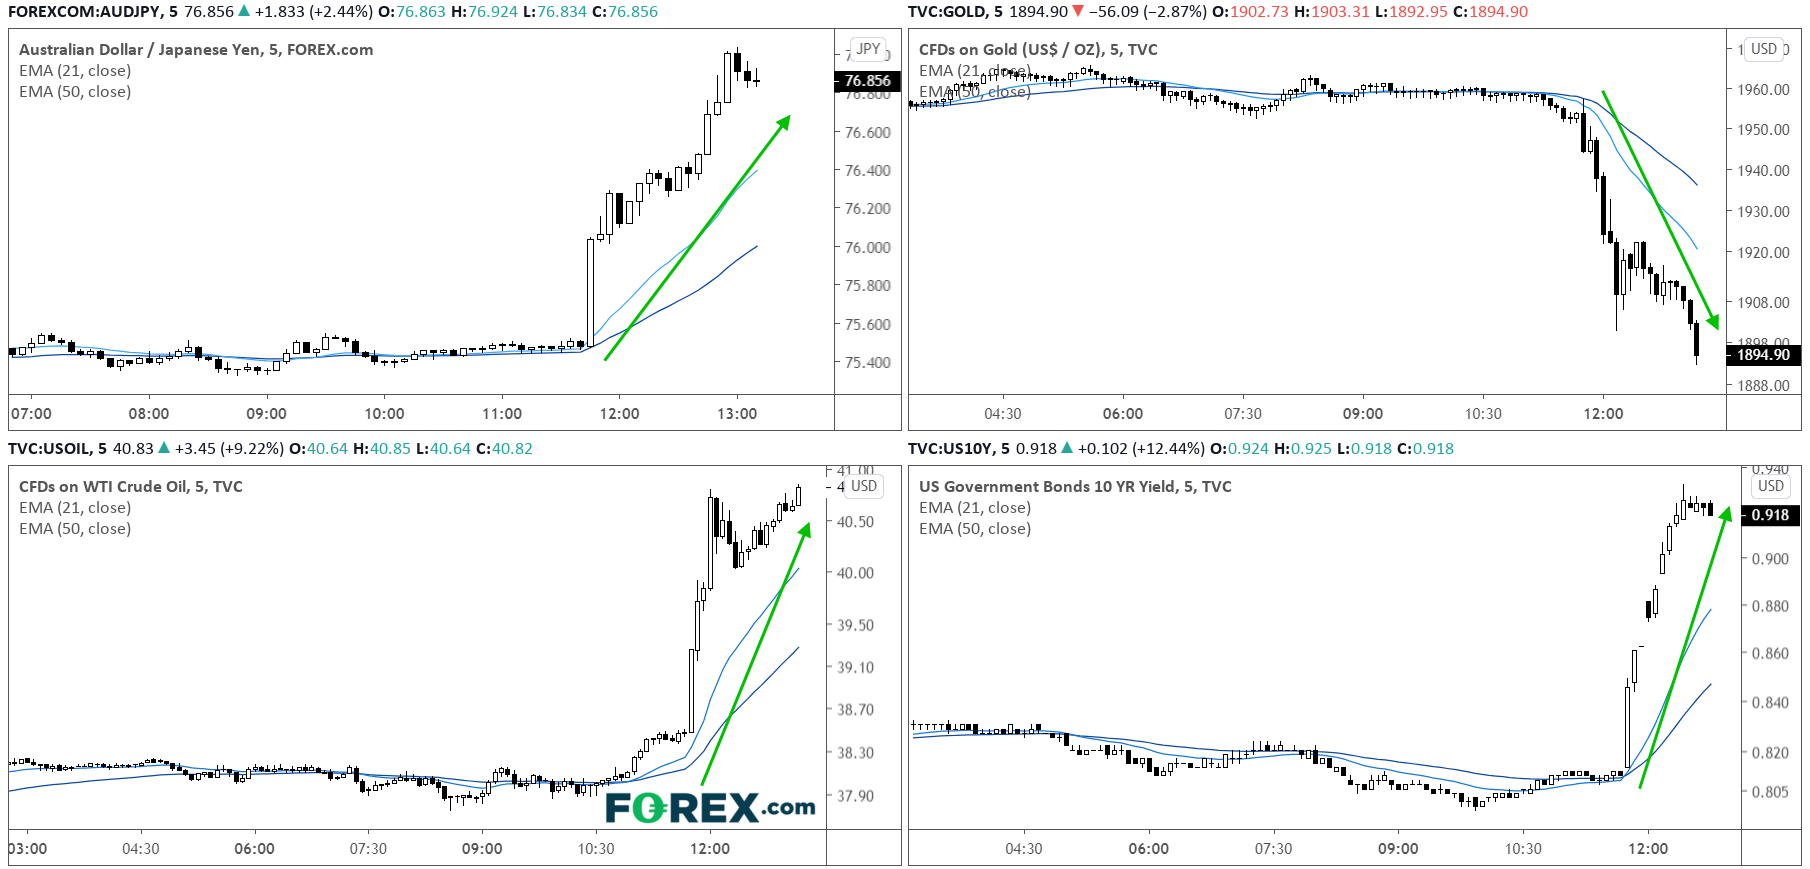 AUDJPY, Gold, WTI, US Govt Bond Chart